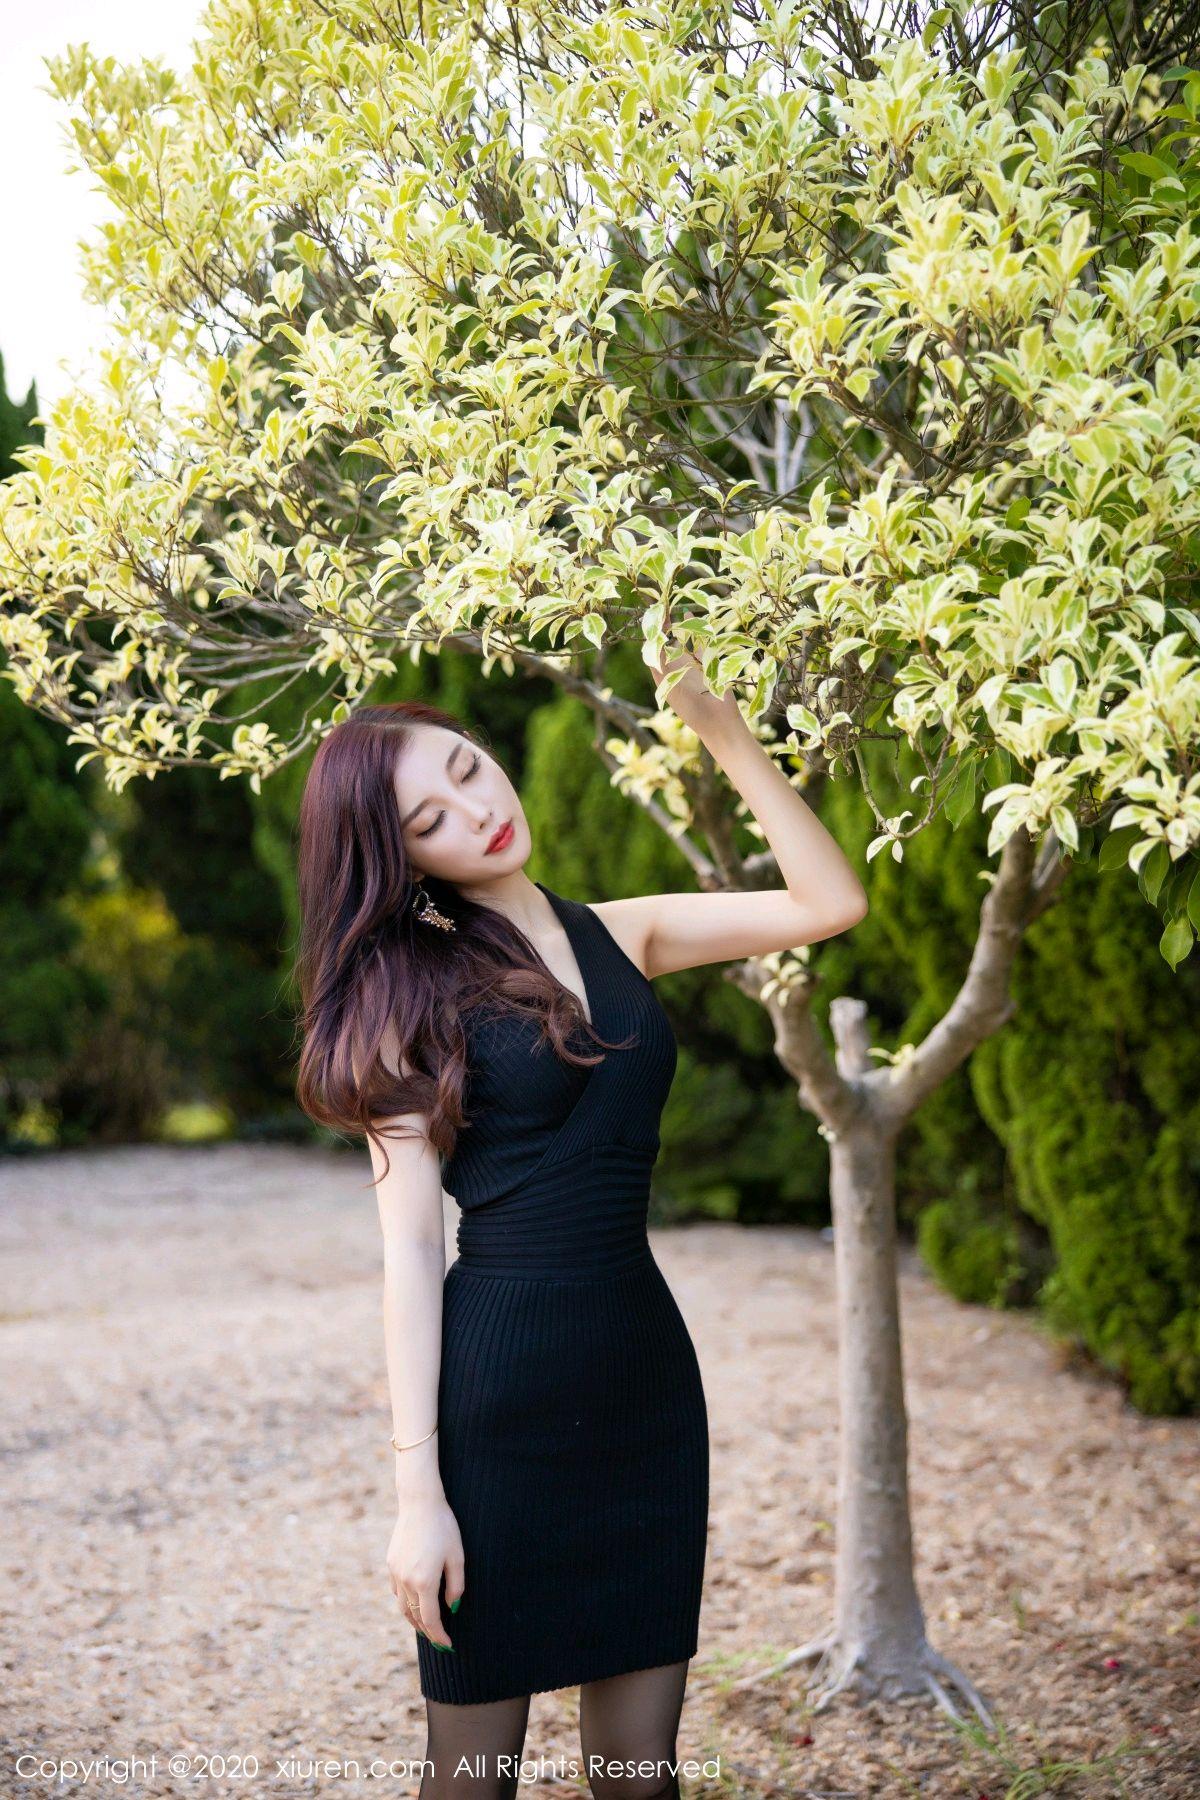 [XiuRen] Vol.2648 Yang Chen Chen 70P, Black Silk, Outdoor, Xiuren, Yang Chen Chen